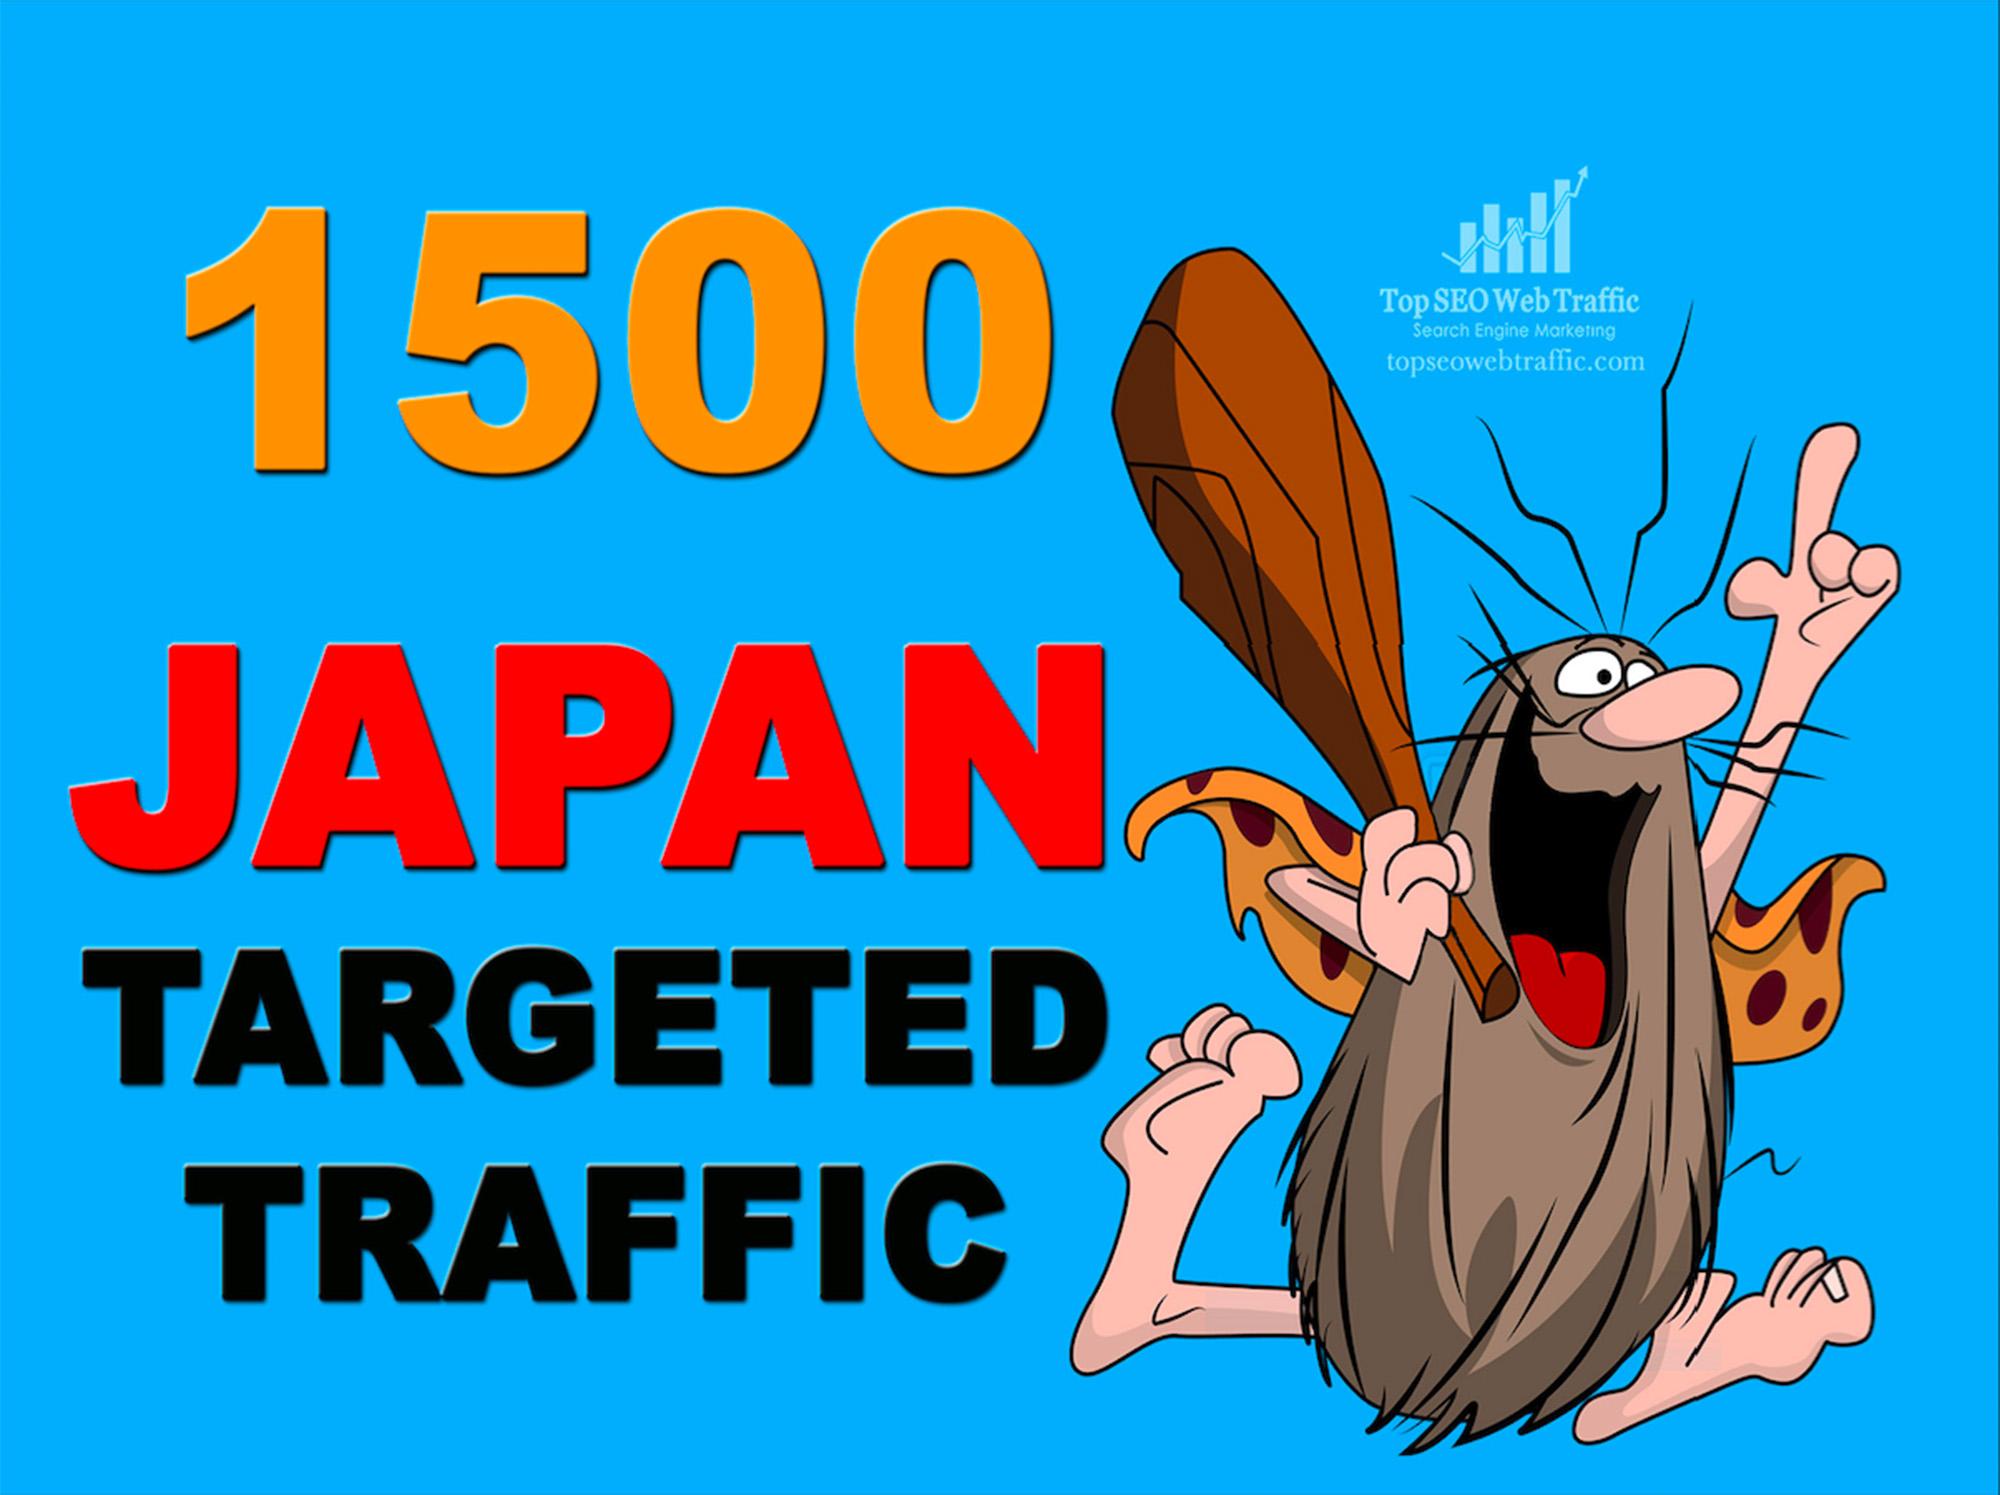 PROVIDE 1,500 HIGHT QUALITY JAPAN WEB TRAFFIC VISITORS